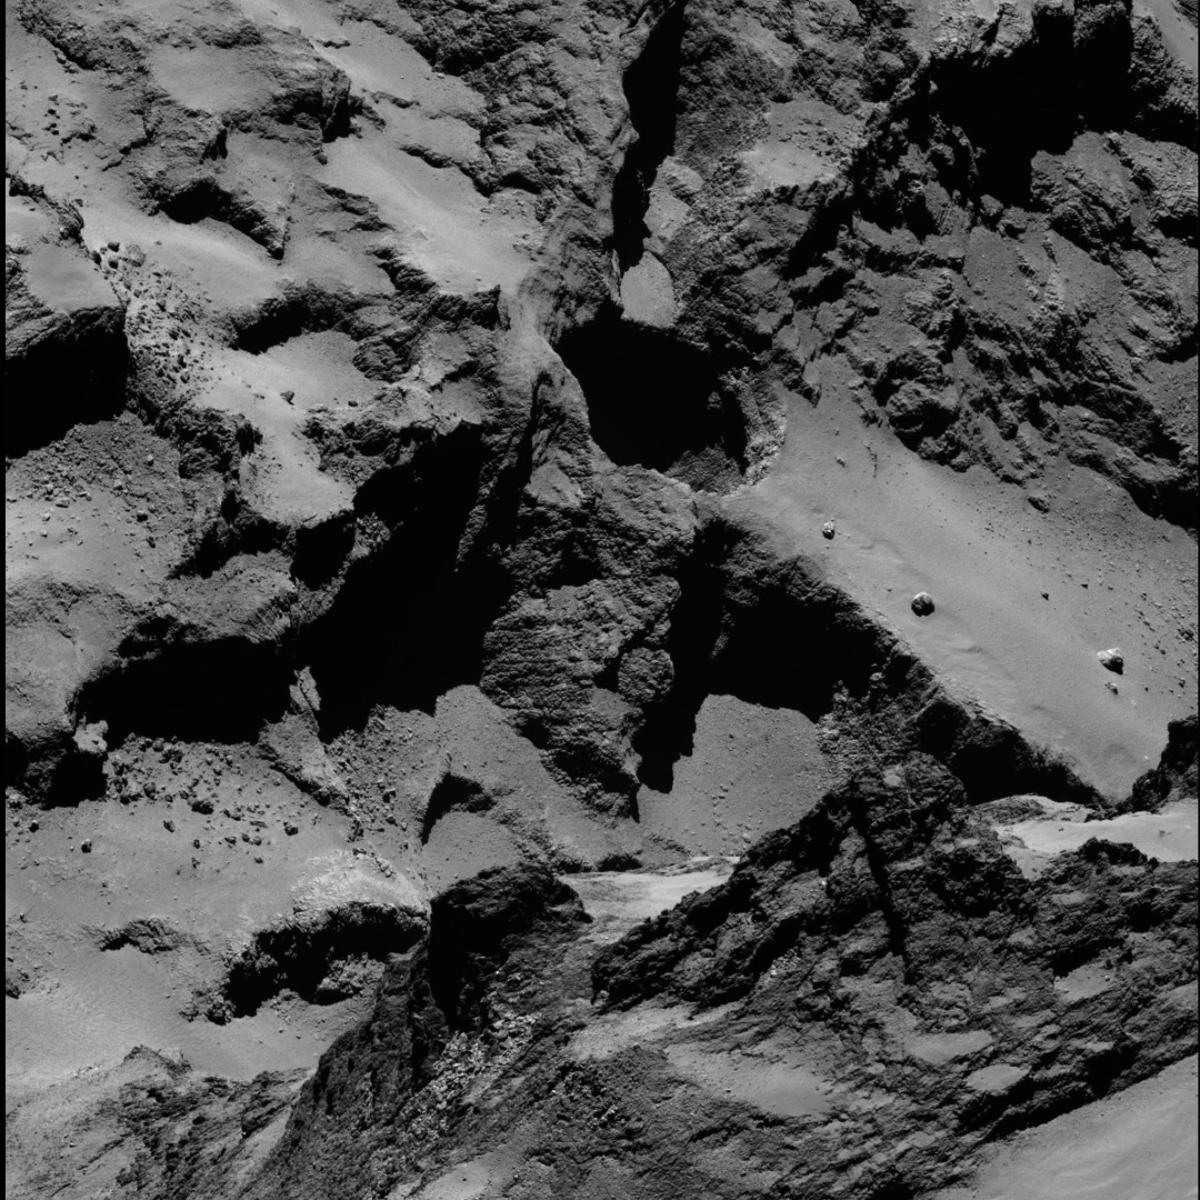 An active sinkhole (center) on 67P